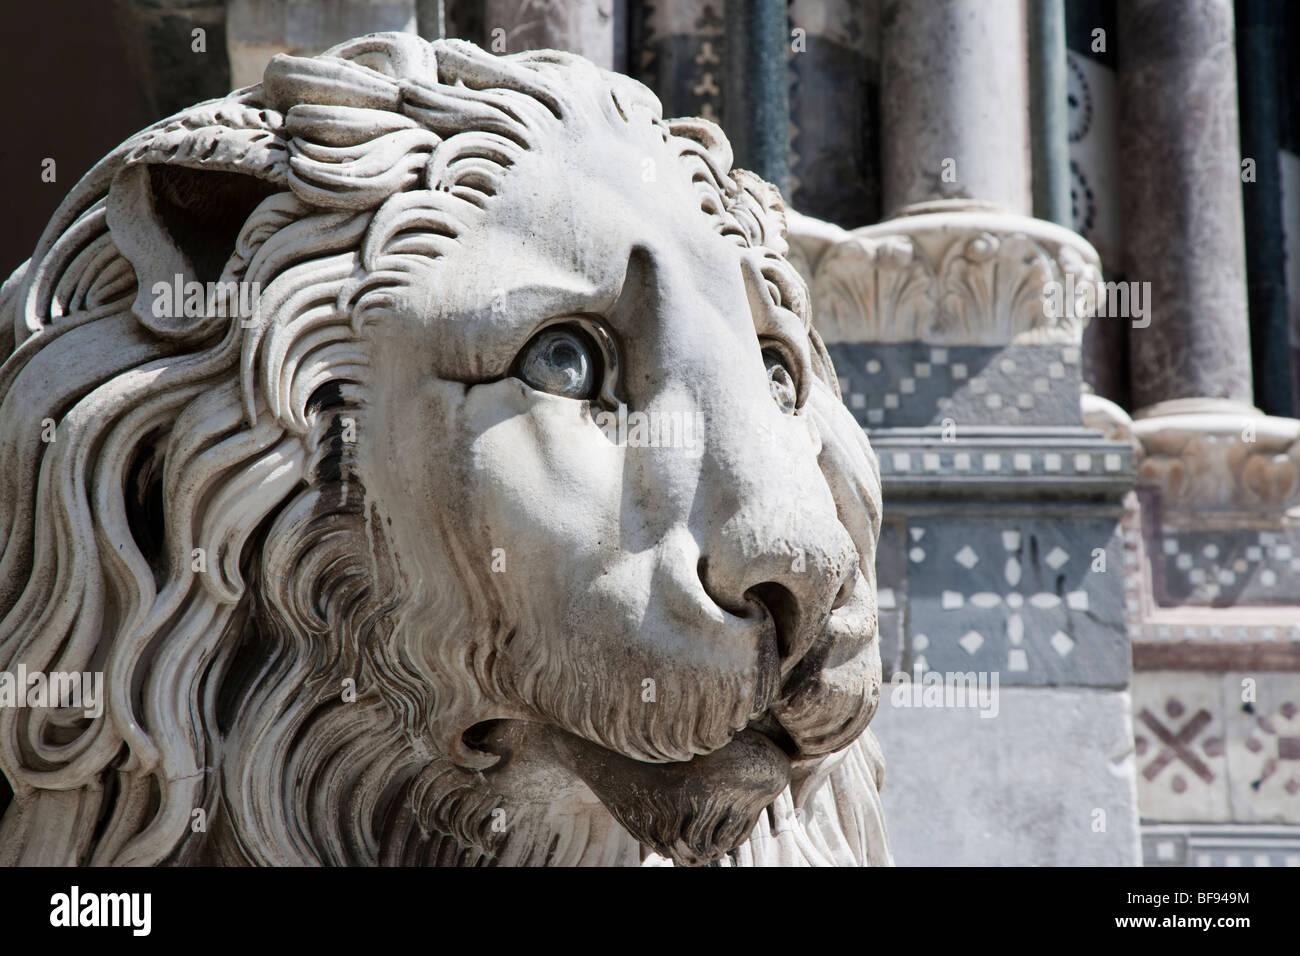 Lion statue at the Cattedrale di San Lorenzo Genoa, Italy - Stock Image